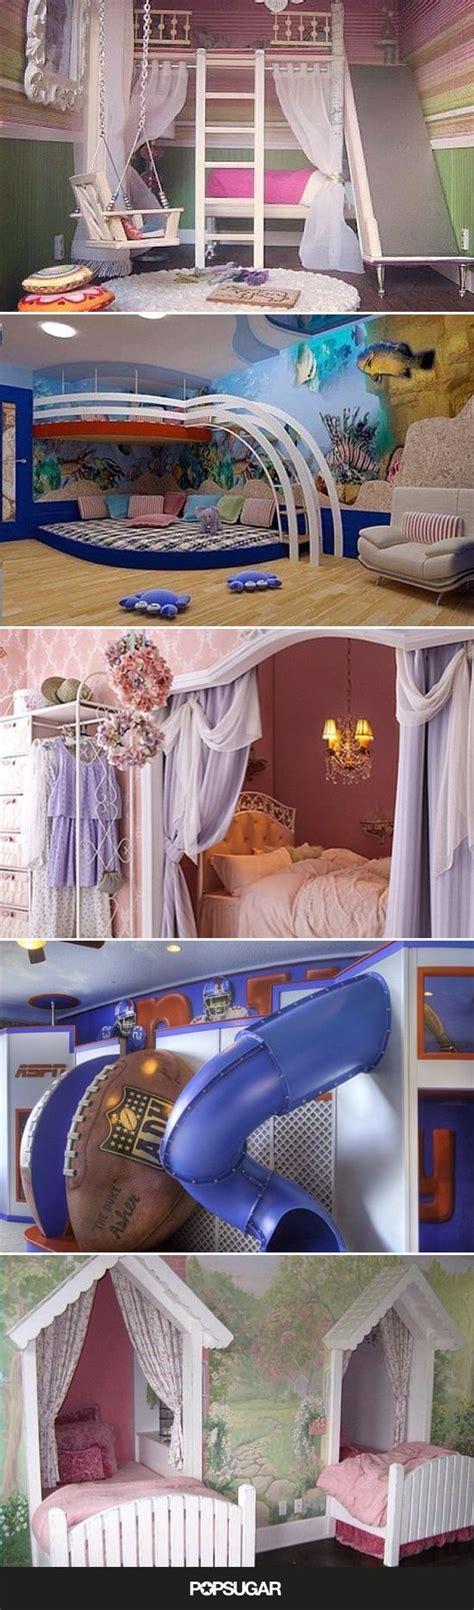 cool bedrooms for kids best 20 bedroom for kids ideas on pinterest